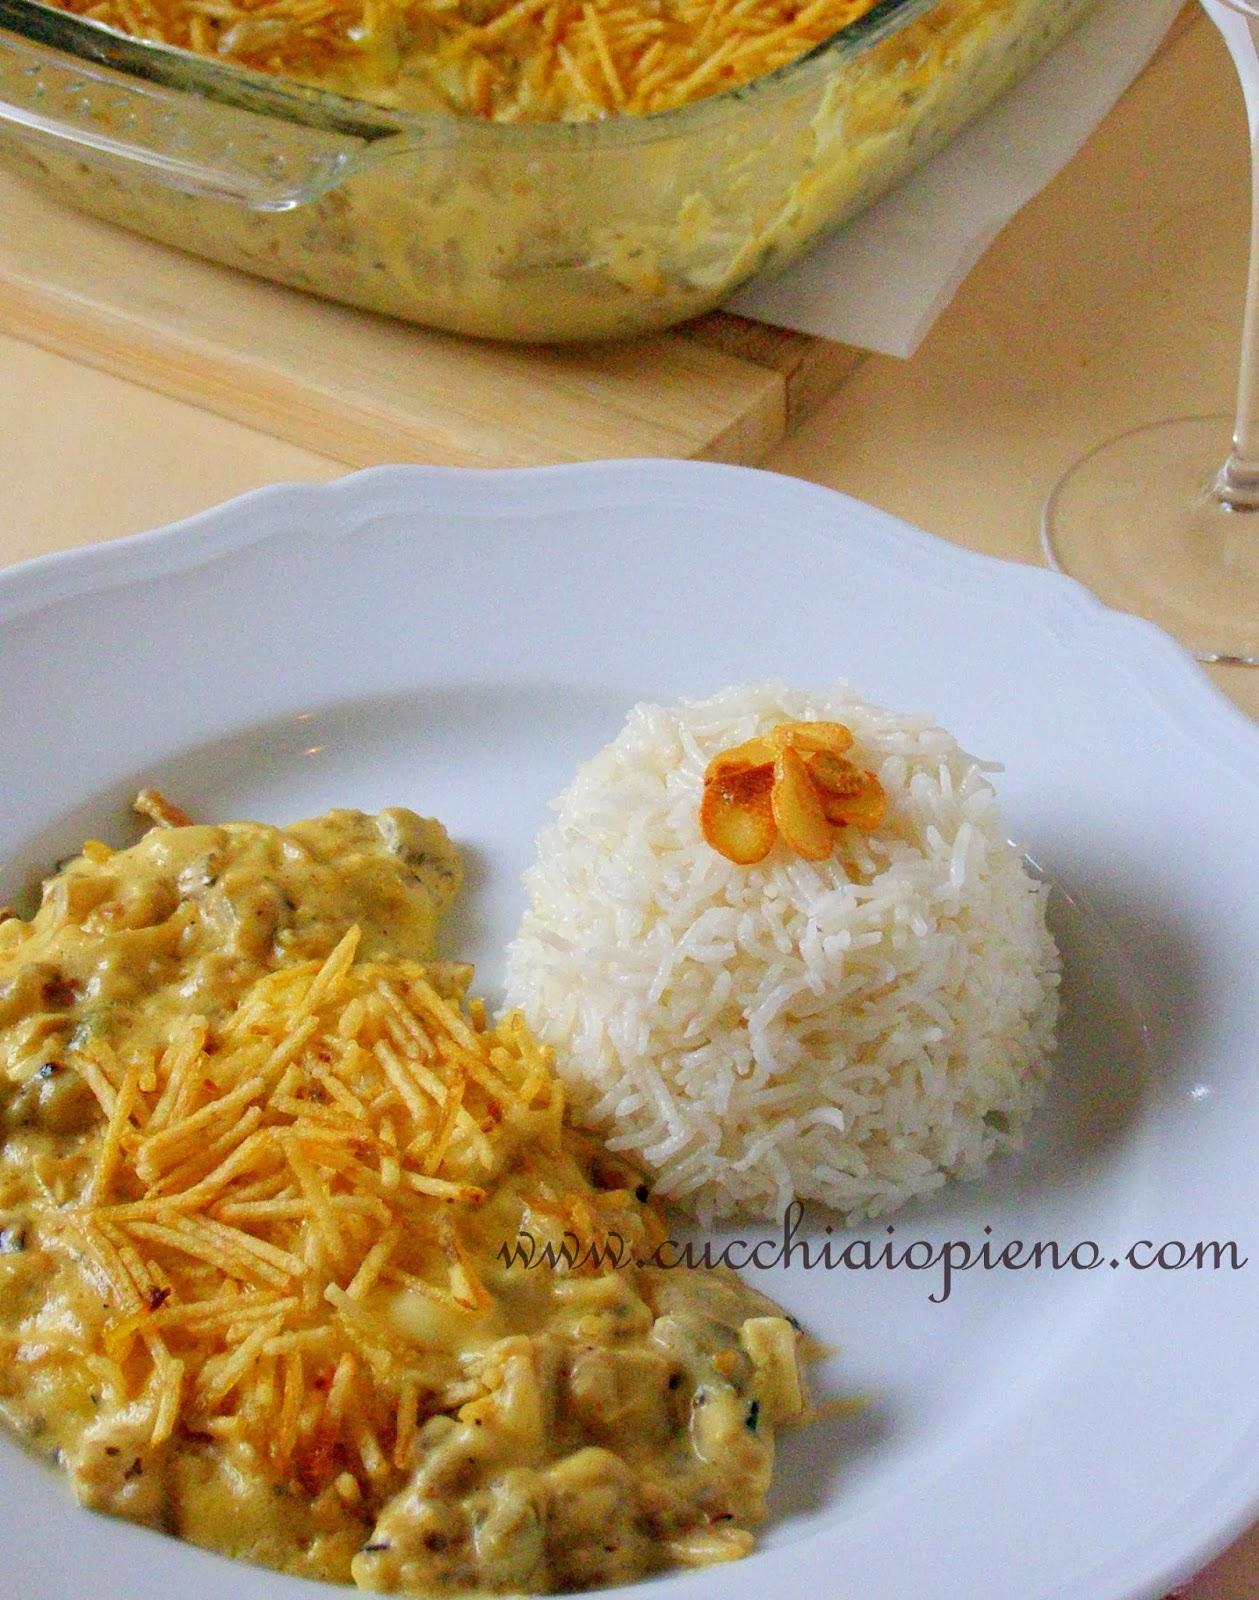 arroz cozido